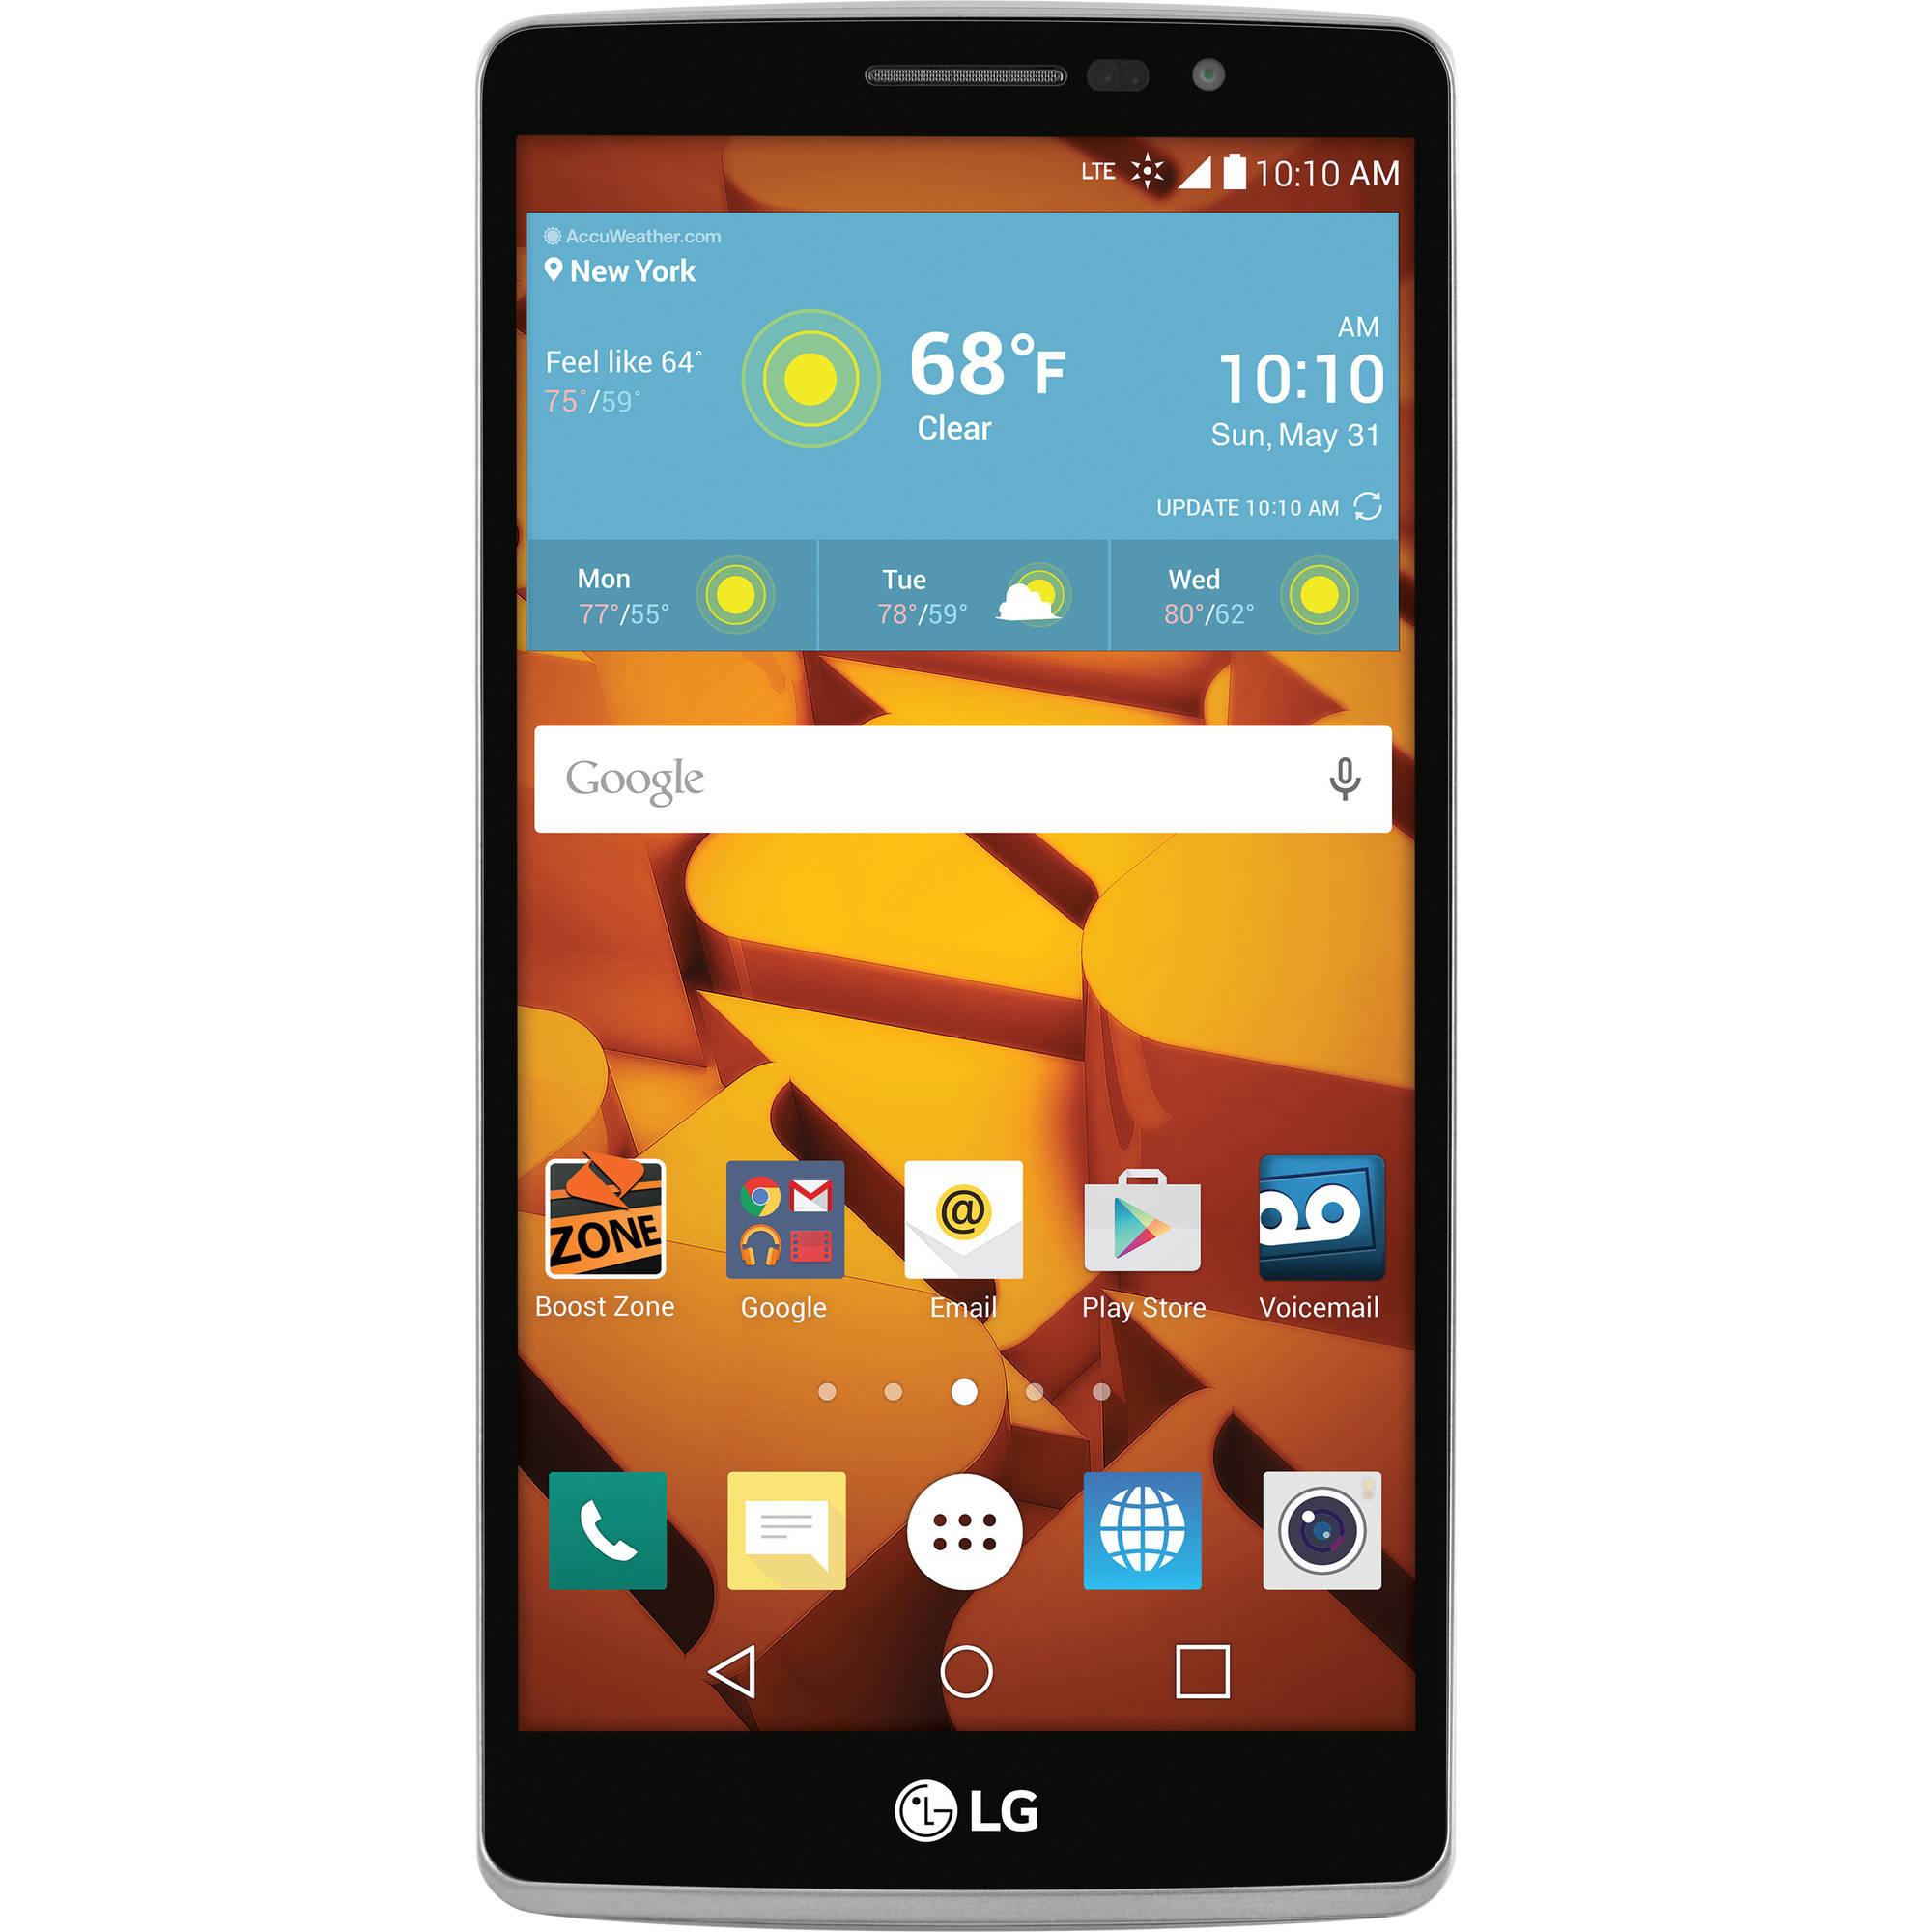 Boost LG Stylo Prepaid Smartphone